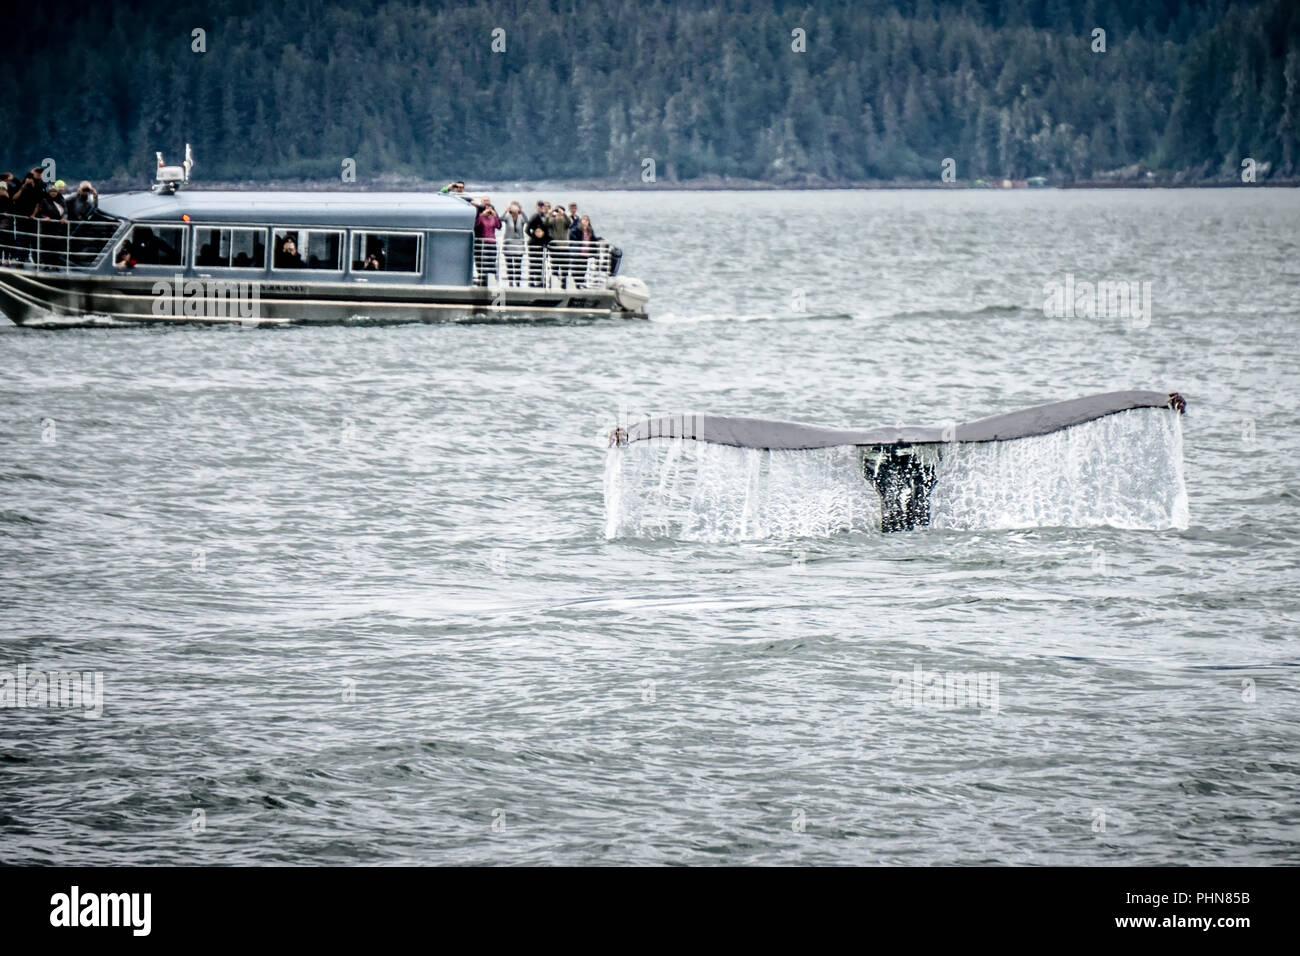 whale watching near skagway alaska - Stock Image